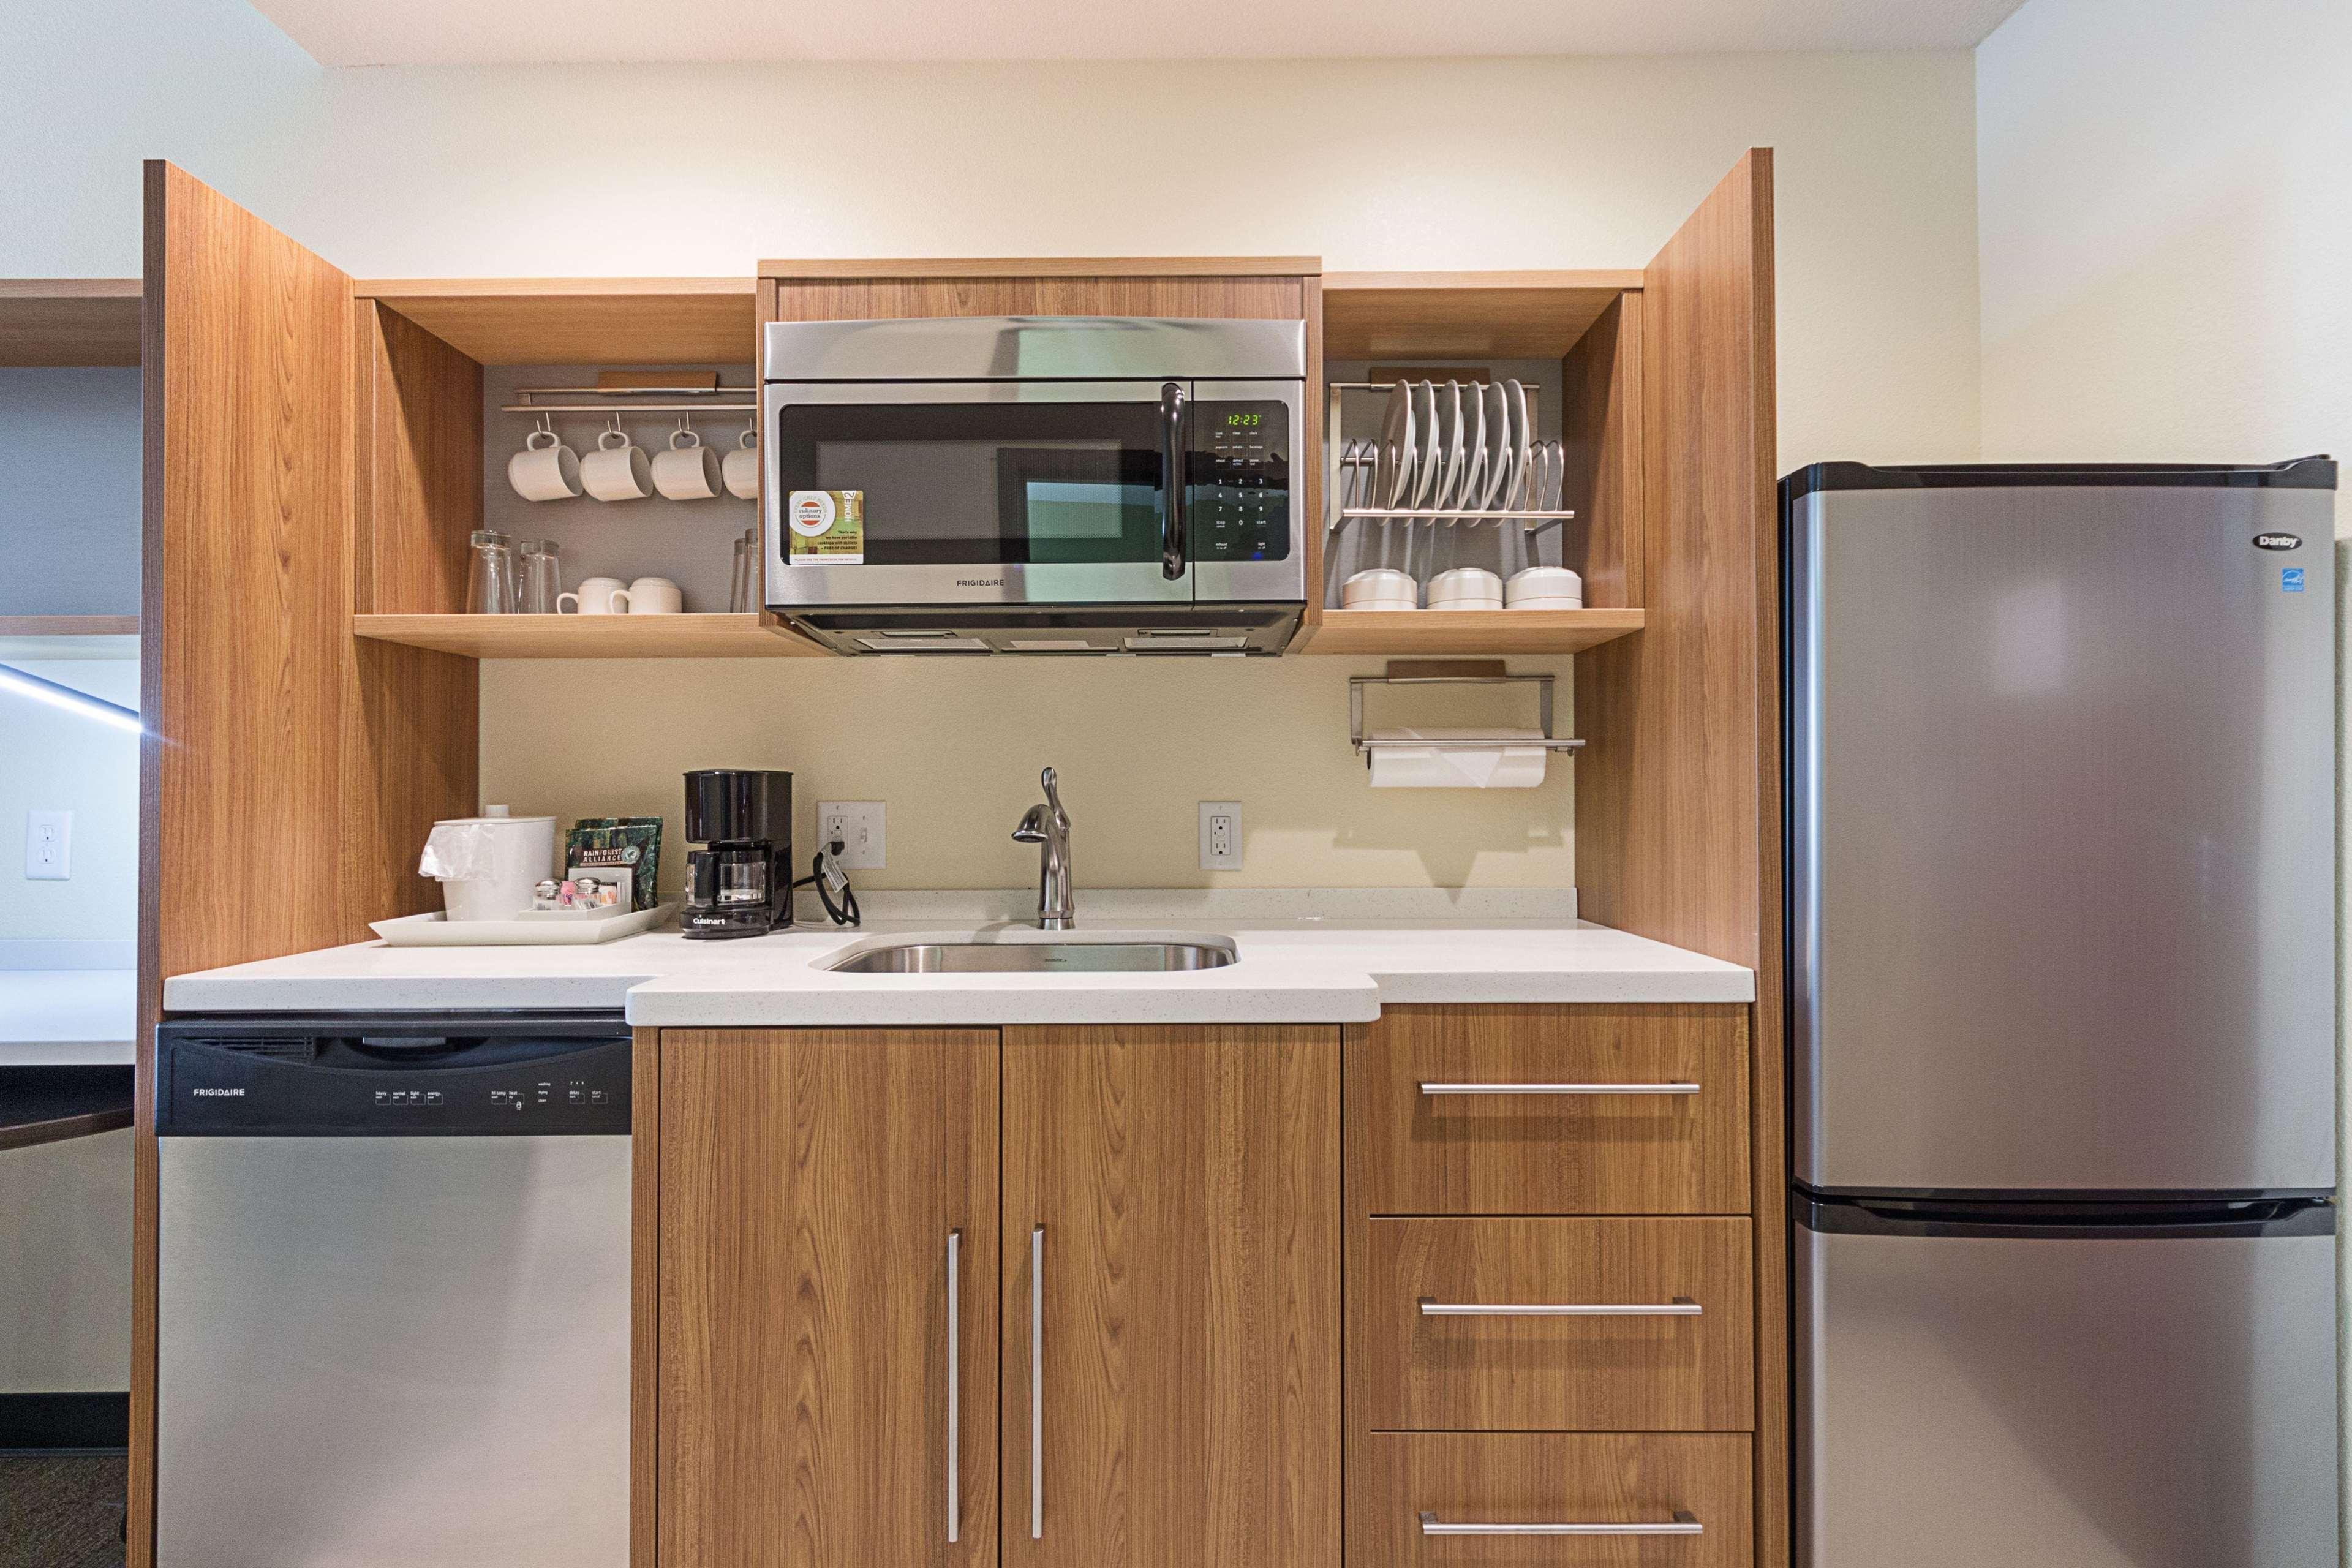 Home 2 Suites by Hilton - Yukon image 49